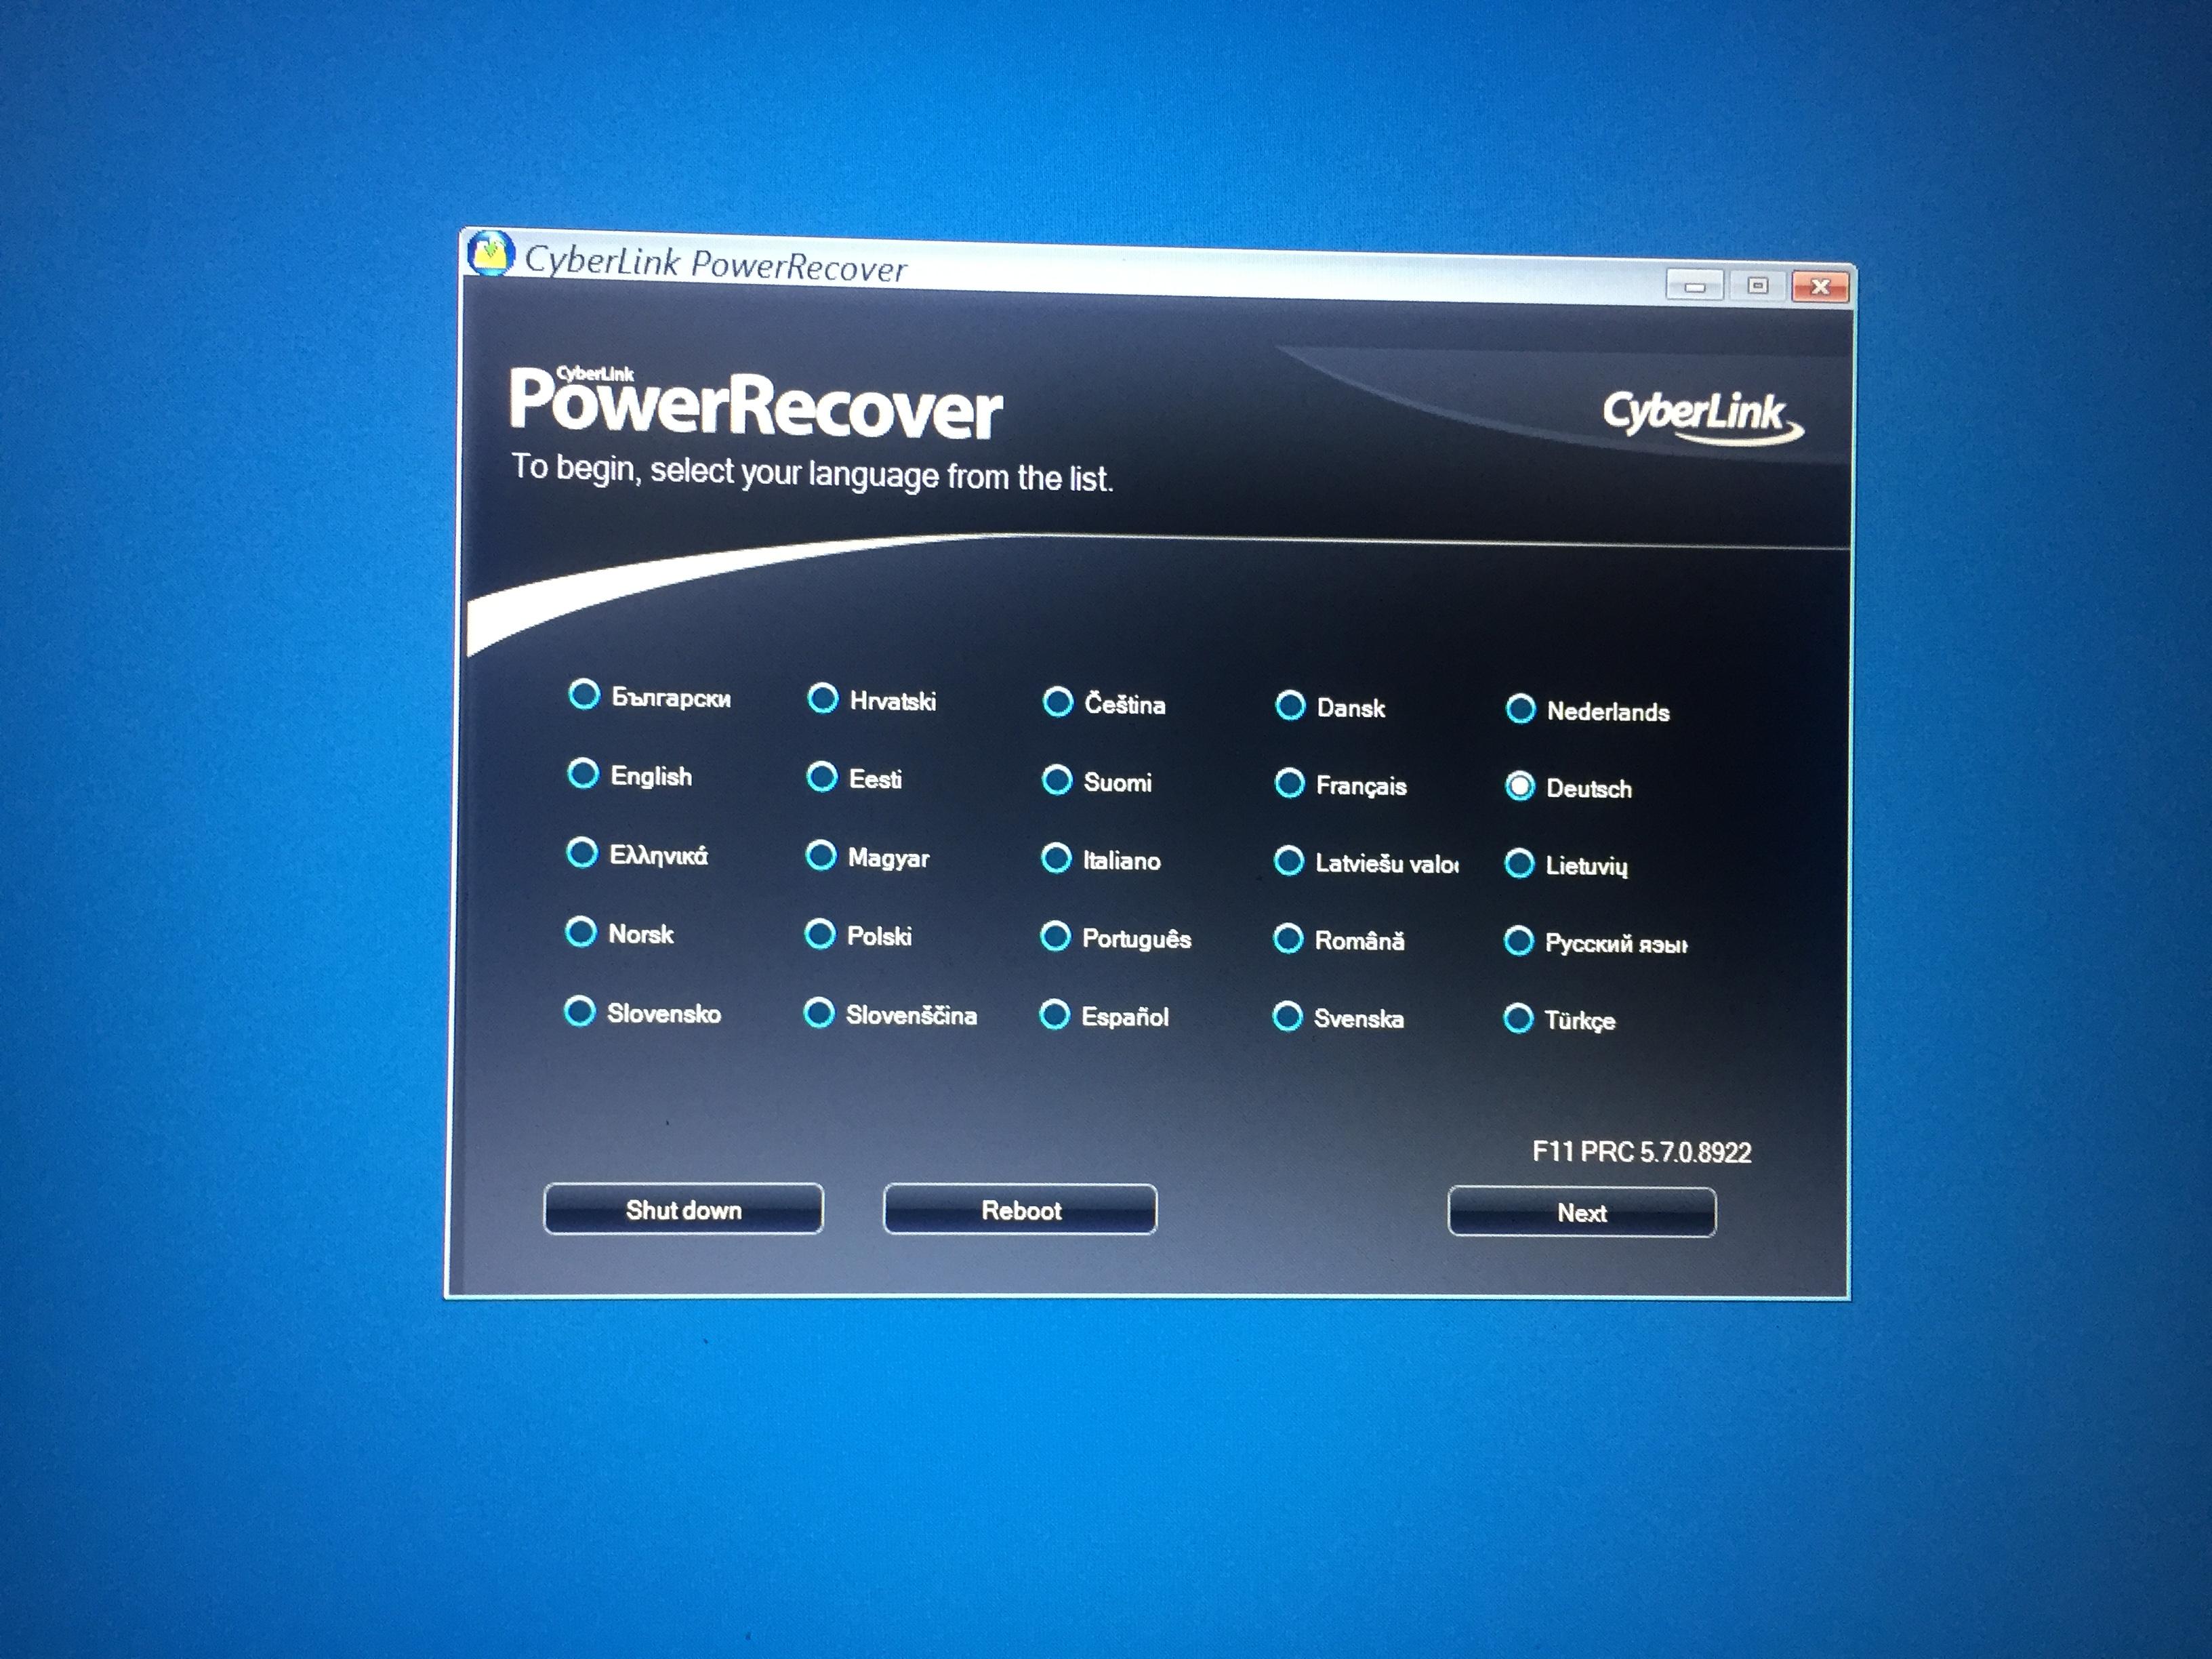 CyberLink PowerRecover Wiederherstellung Endlosschleife